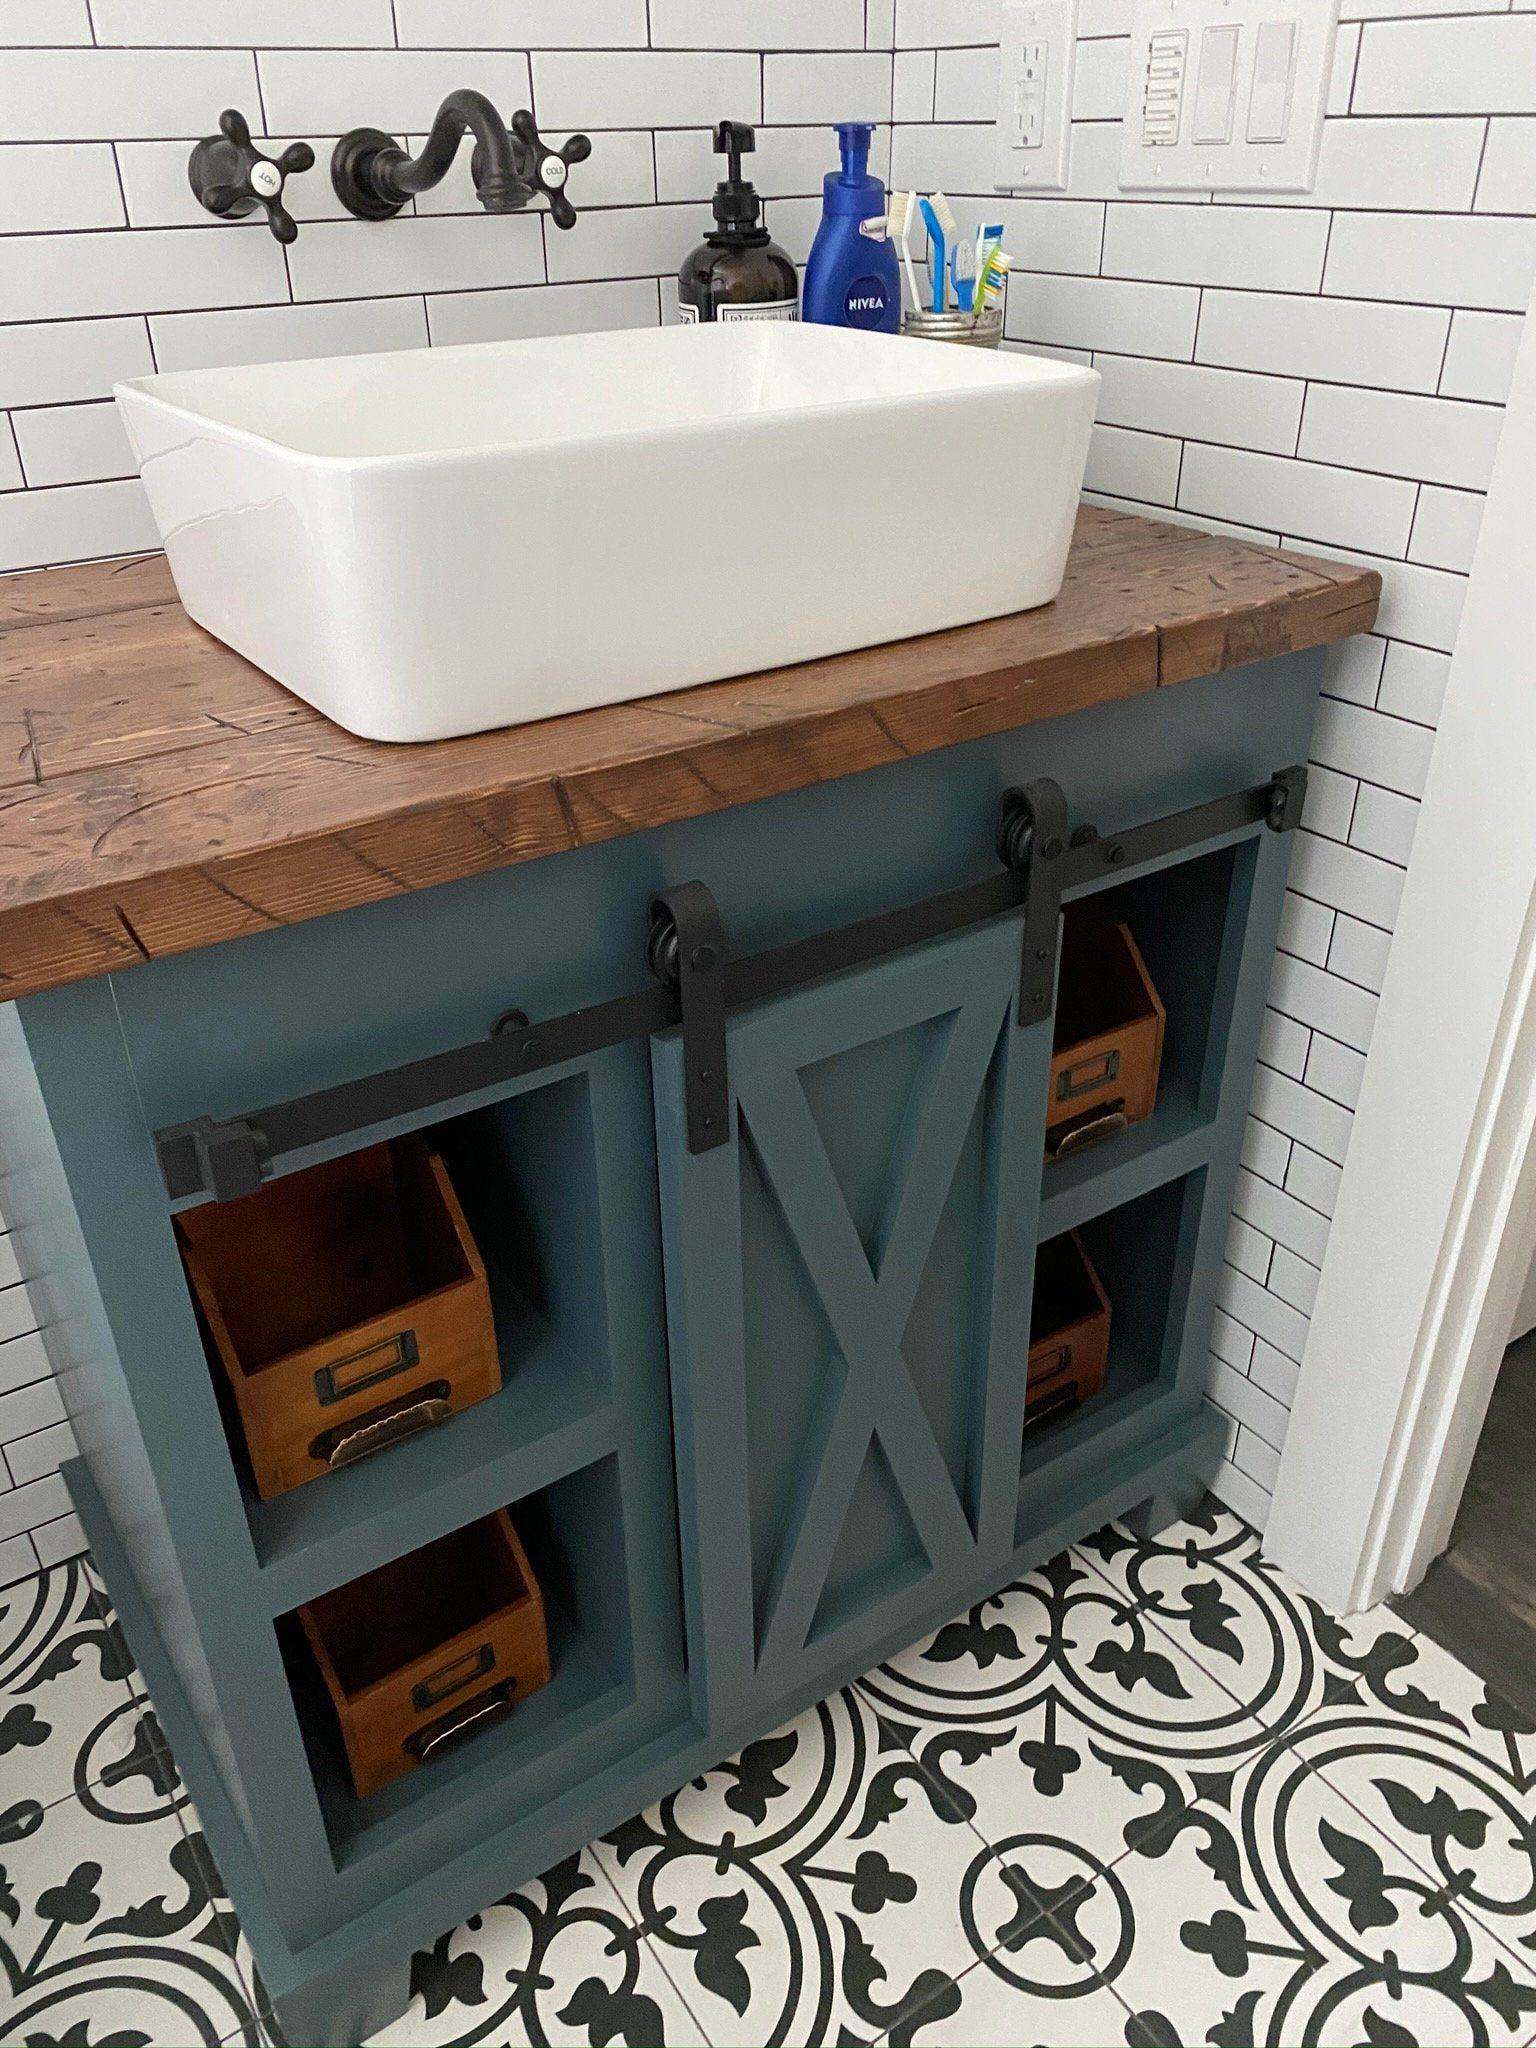 Barn Door Bathroom Vanity Free Shipping Etsy Furniture Giveaway Bathroom Vanity Vanity [ 2048 x 1536 Pixel ]